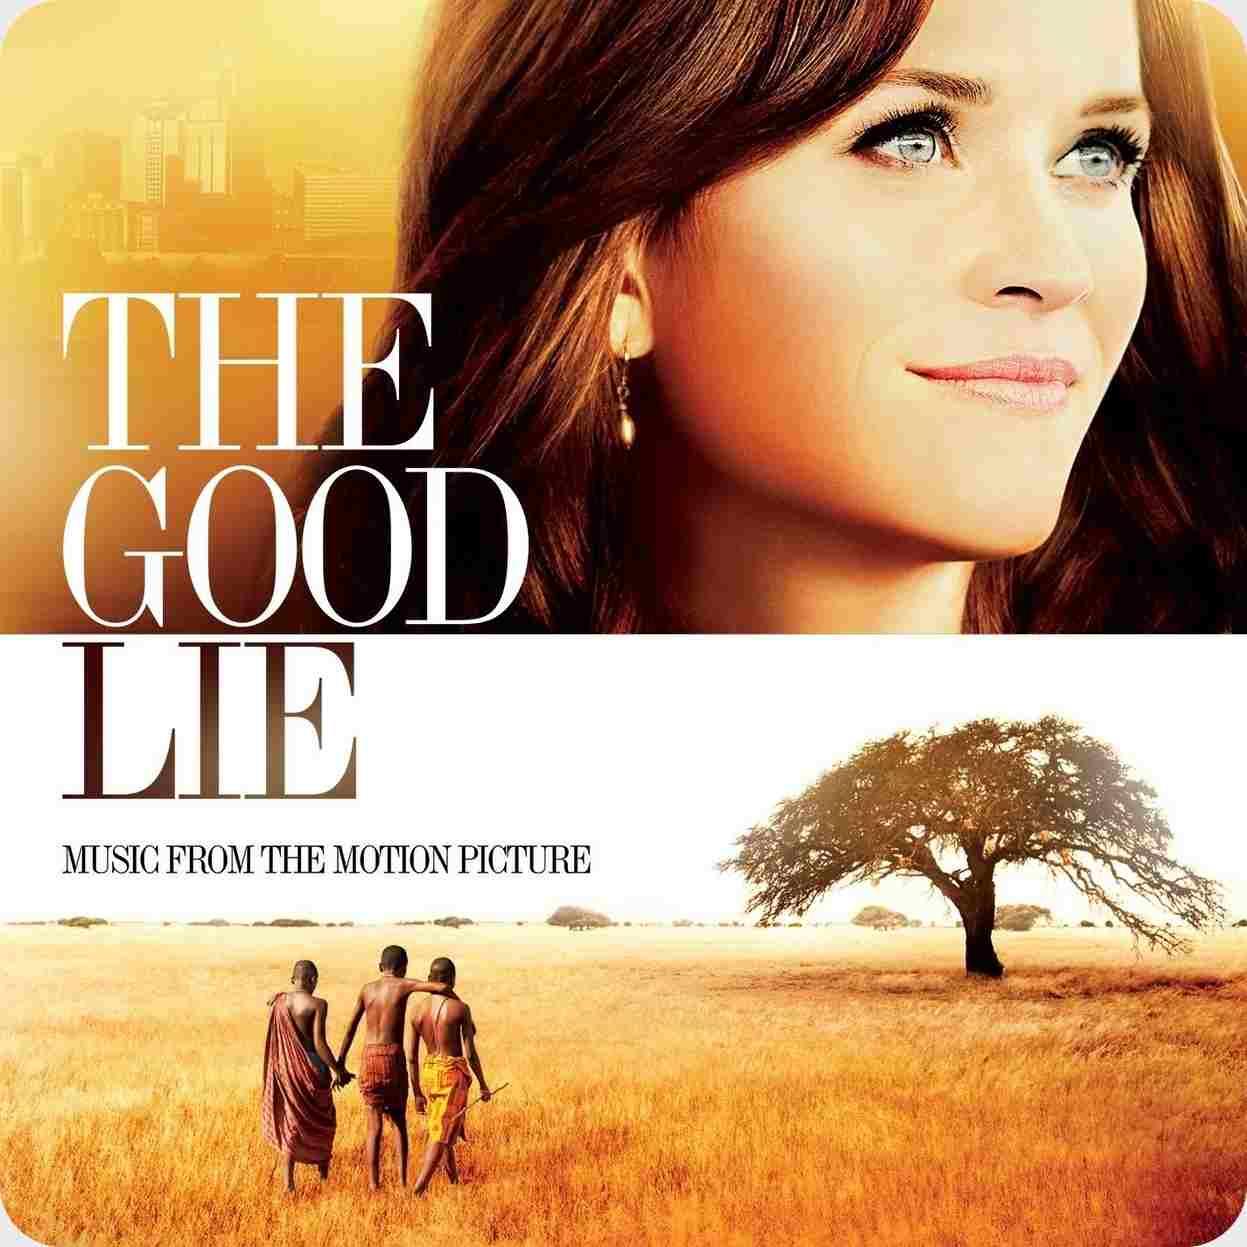 فیلم The Good Lie 2014